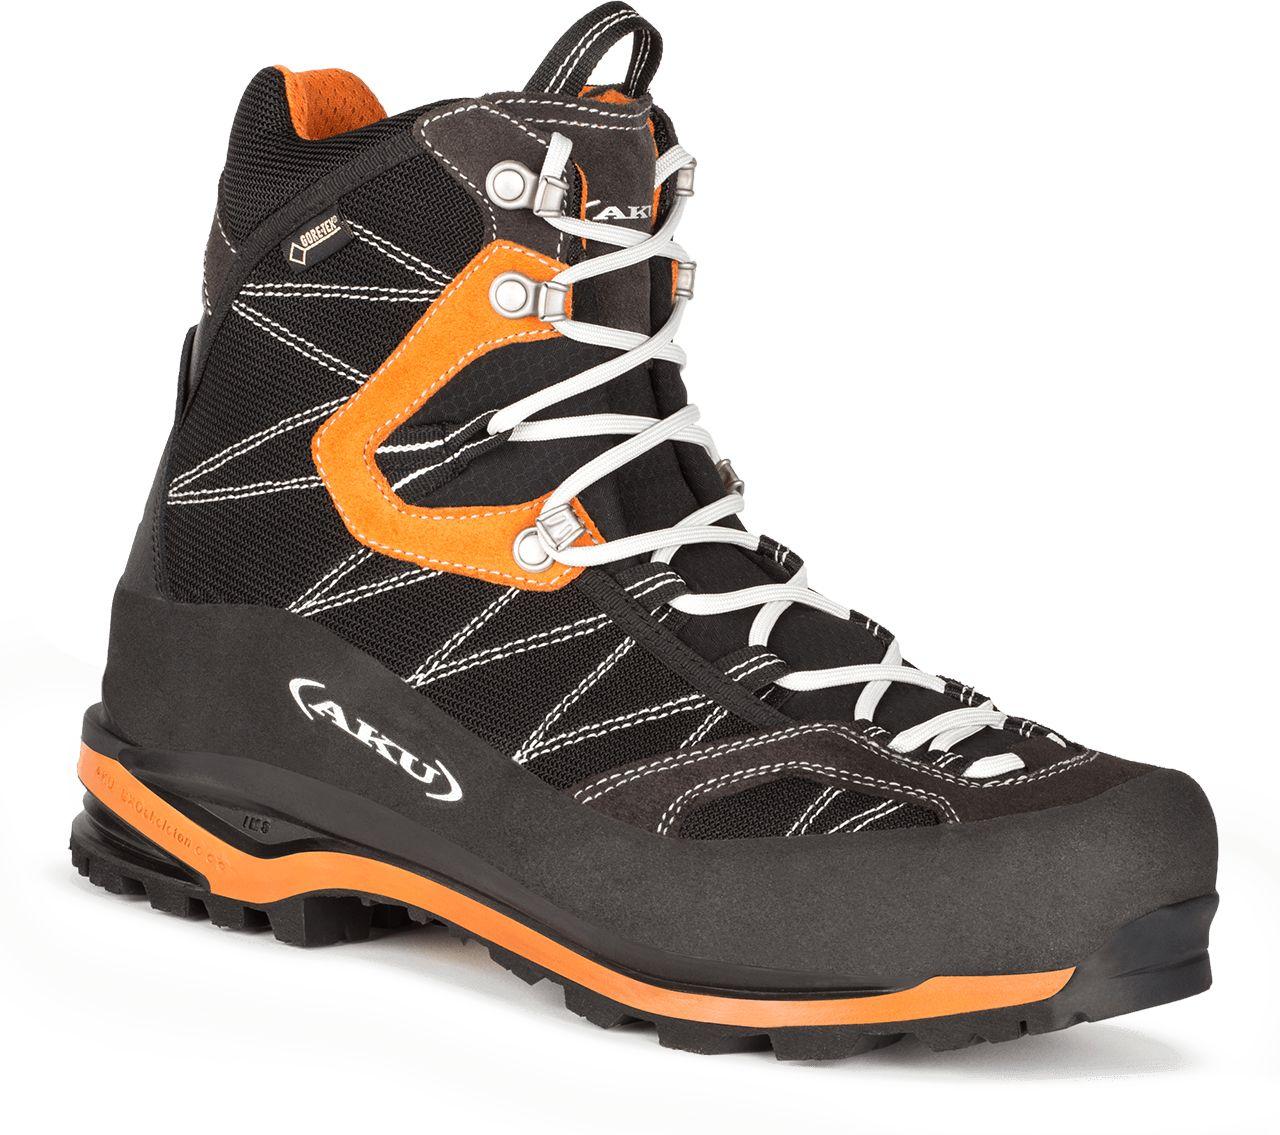 Aku Buty meskie Tangu Lite GTX black/ orange r. 43 975-108-9 Tūrisma apavi